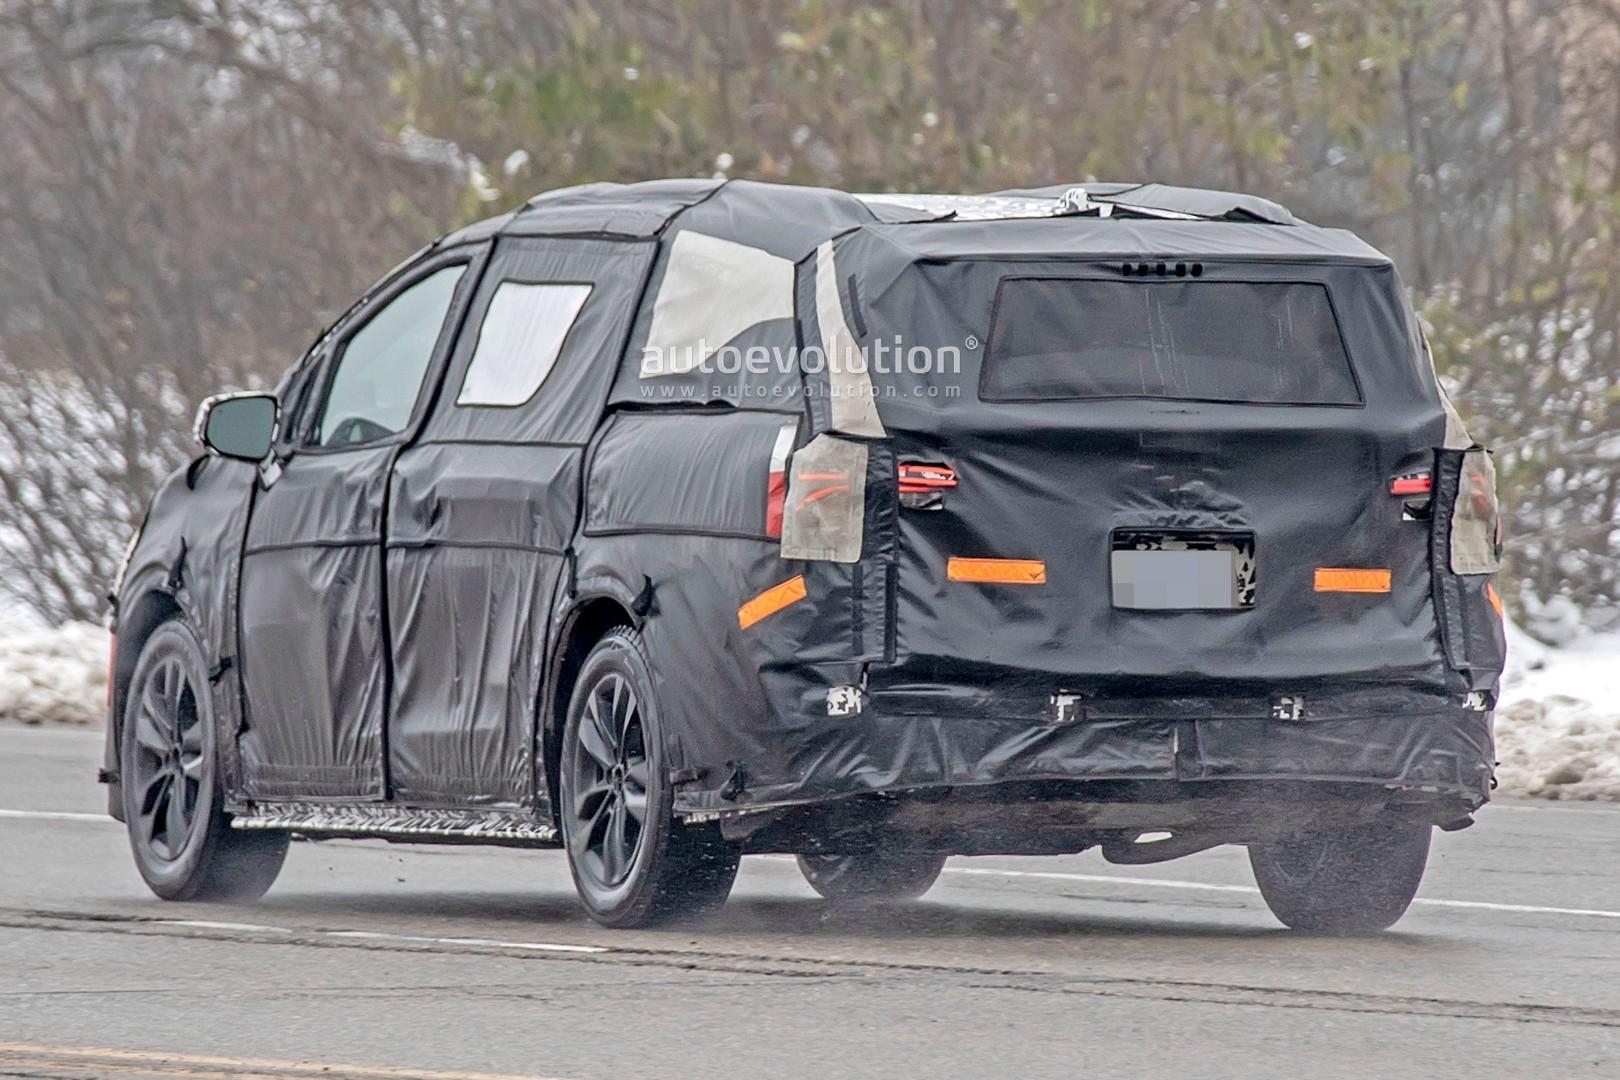 2020 - [Toyota] Sienna  2021-toyota-sienna-spied-testing-in-detroit-looks-like-a-bigger-modern-minivan_10